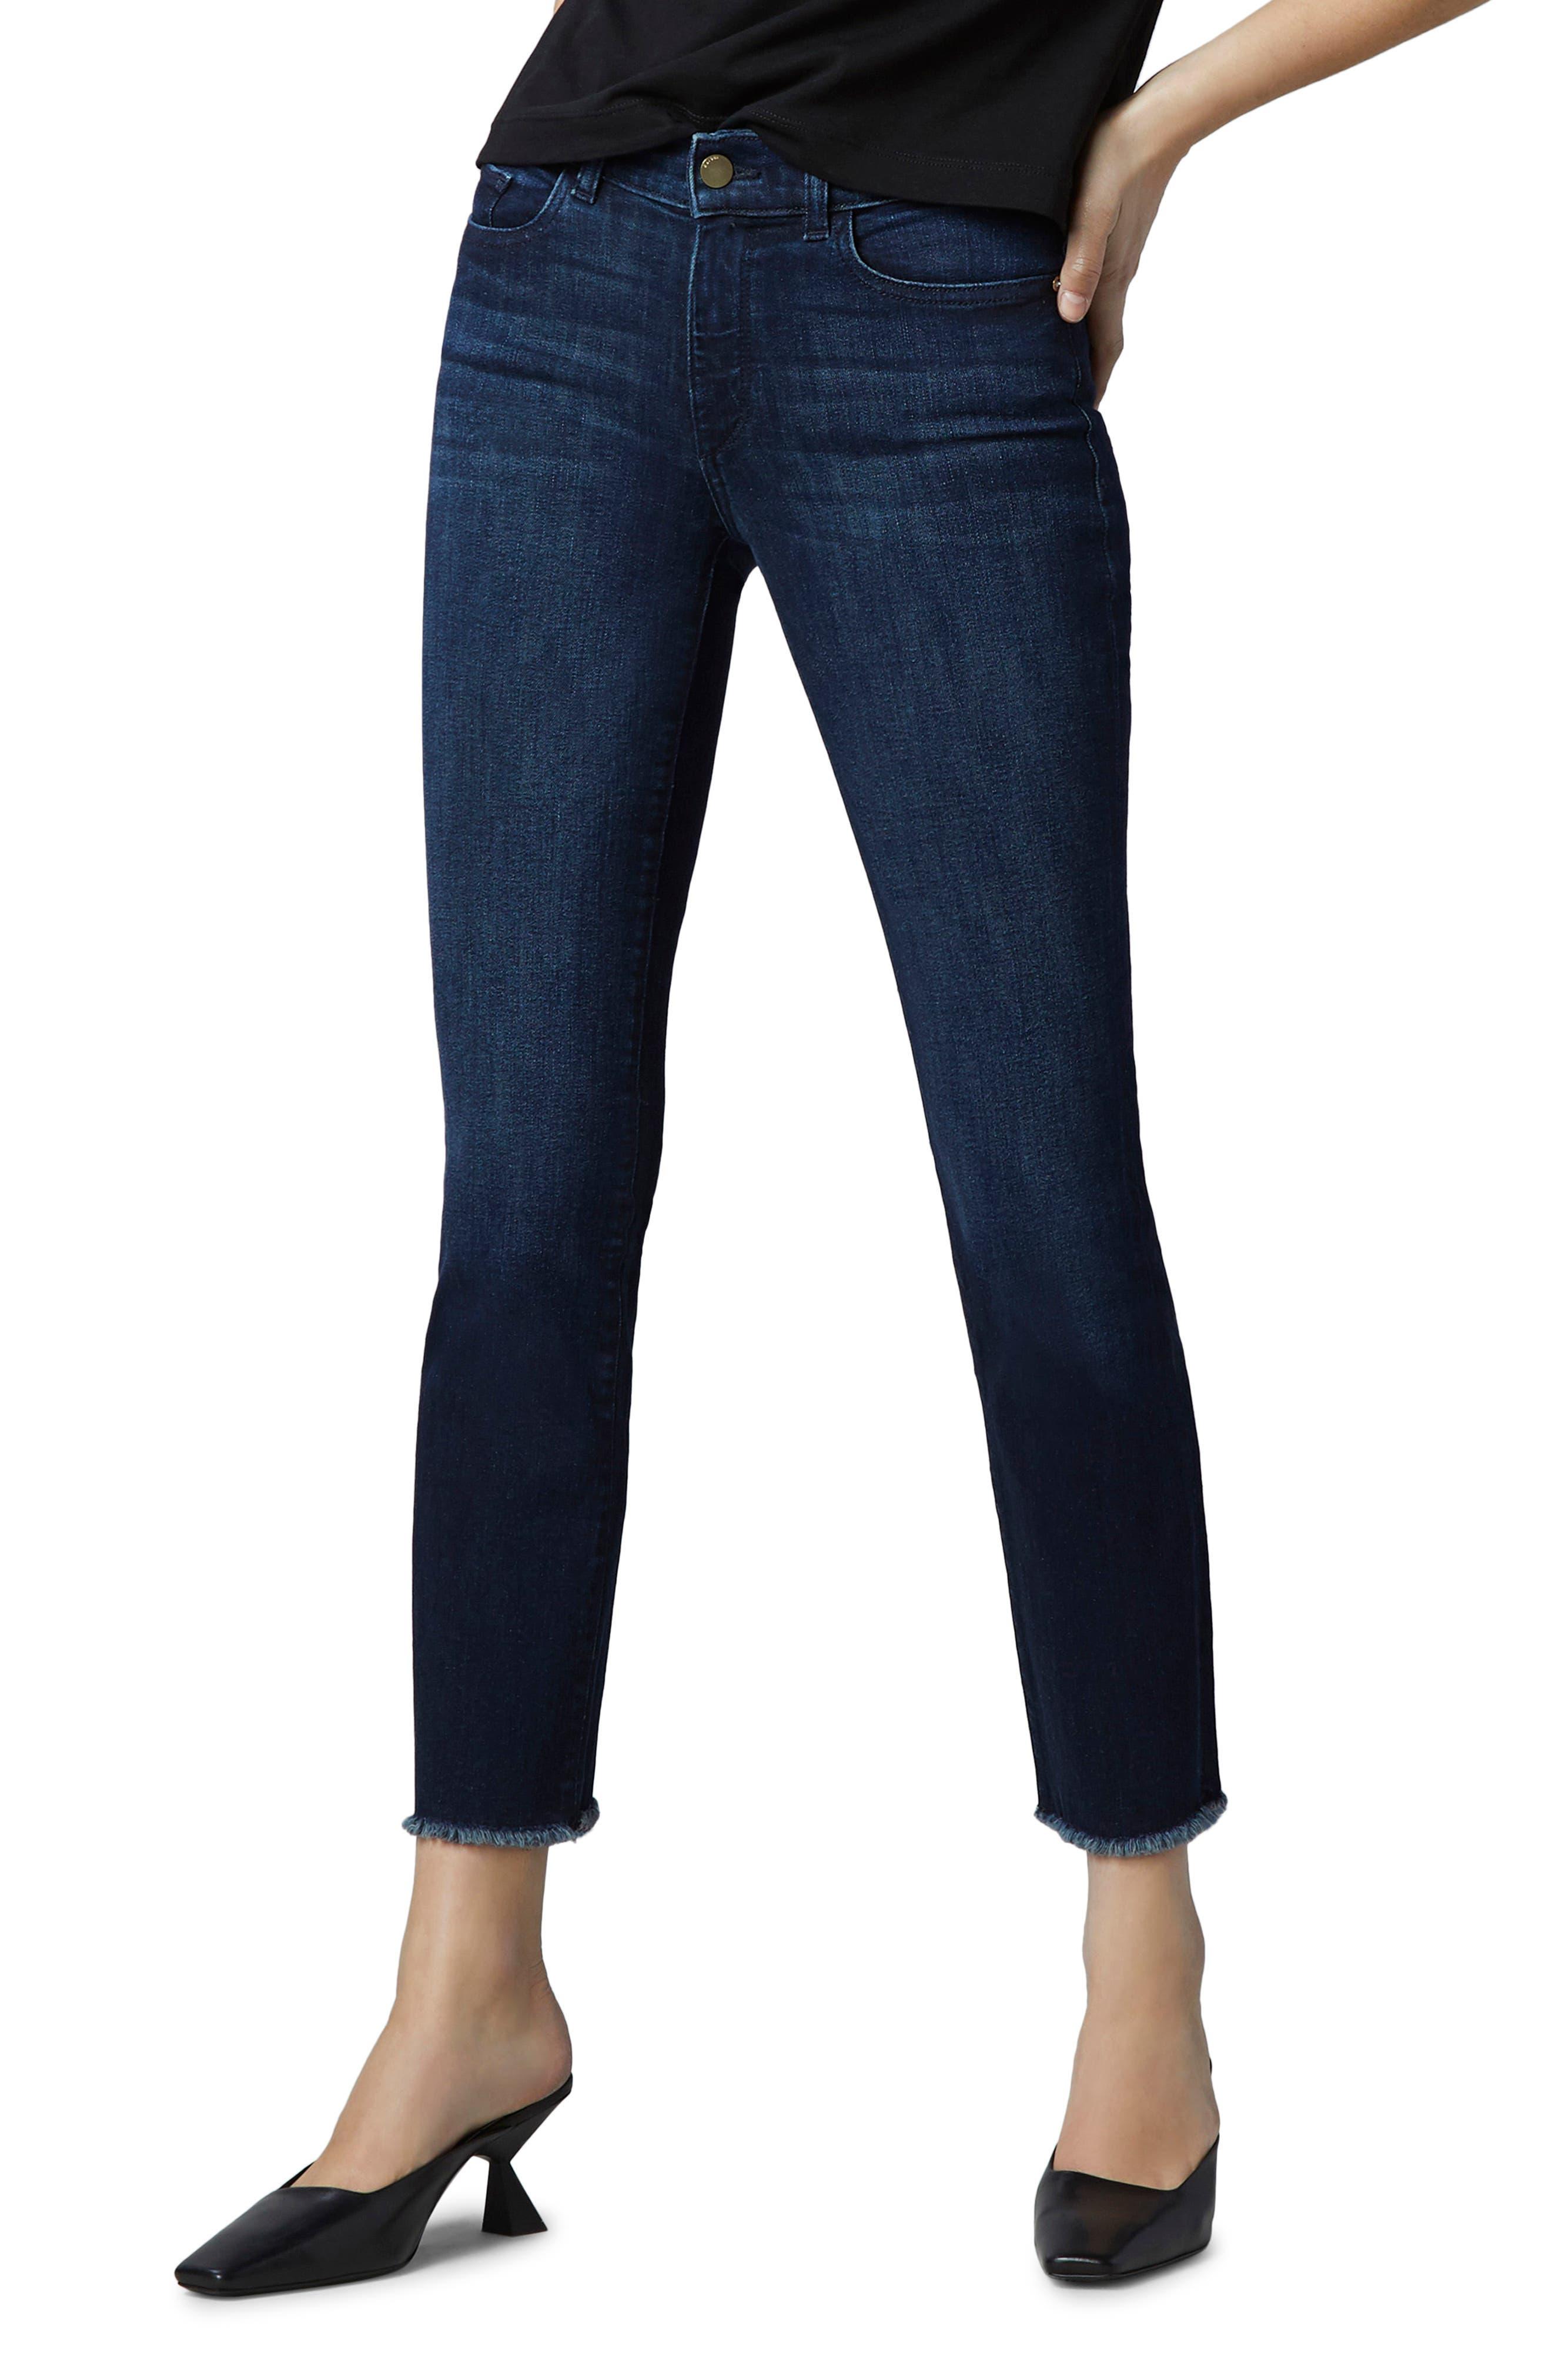 1961 Mara Instasculpt Mid Rise Ankle Slim Jeans